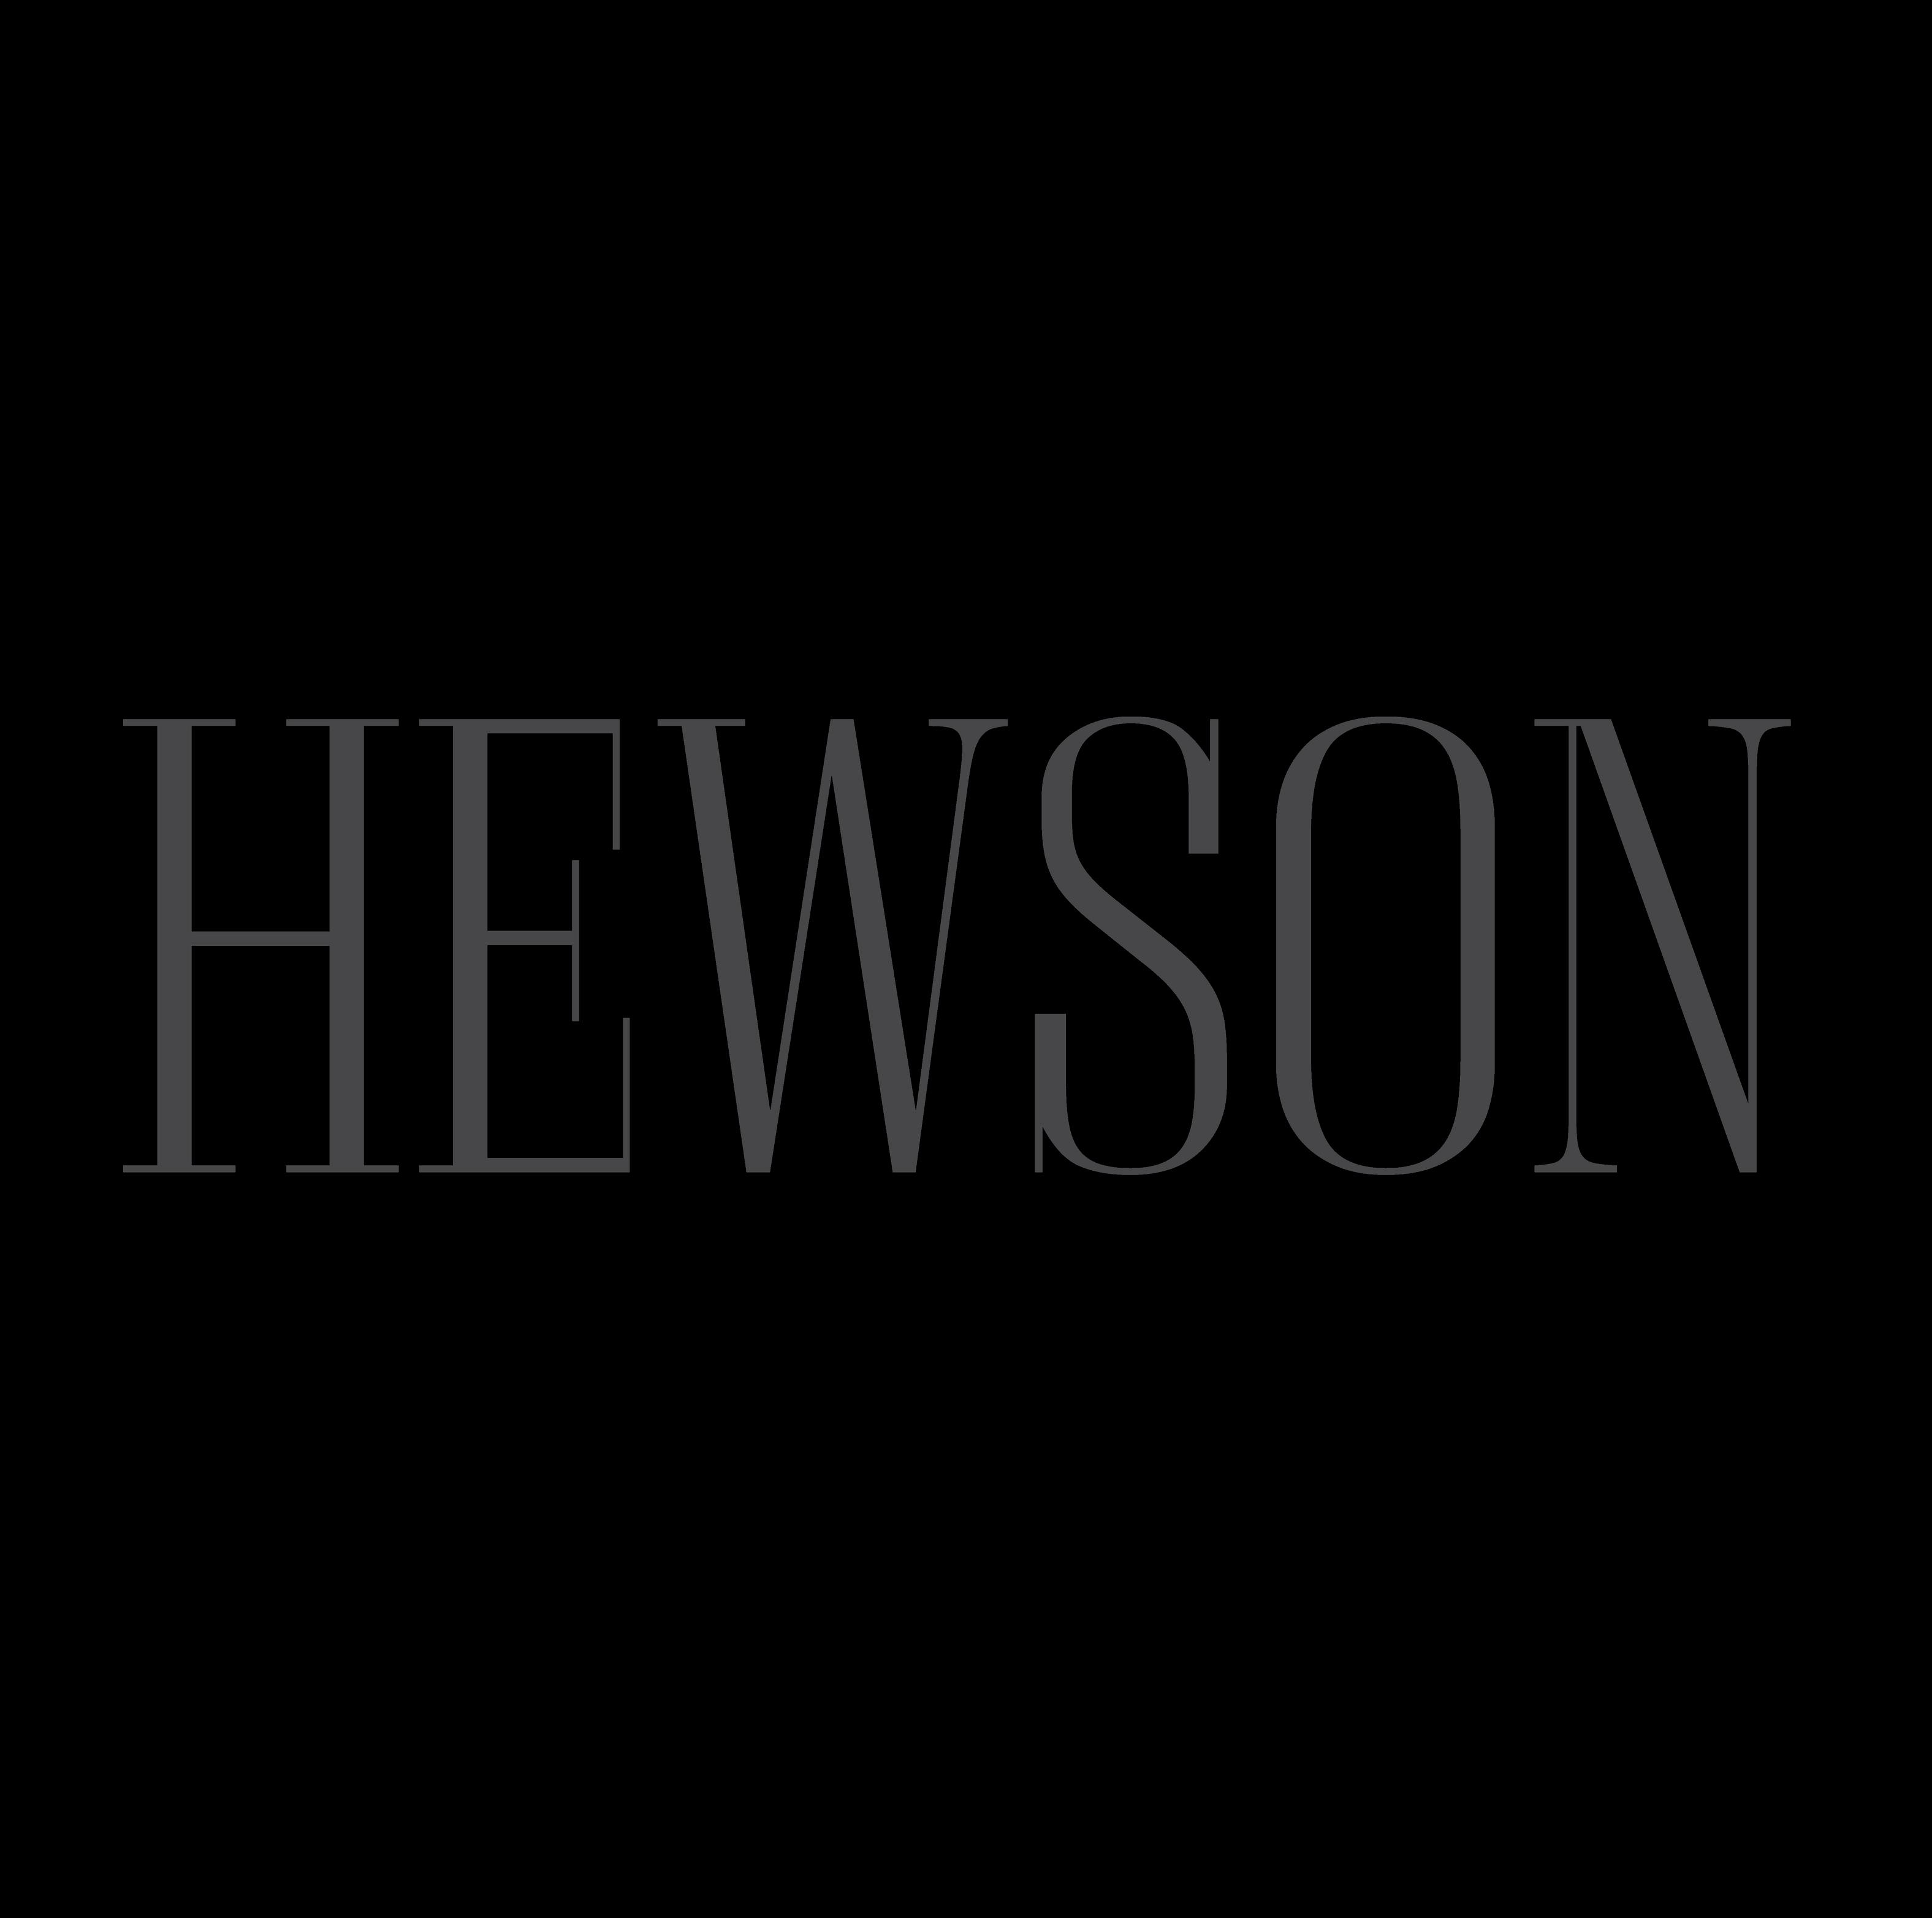 David Hewson